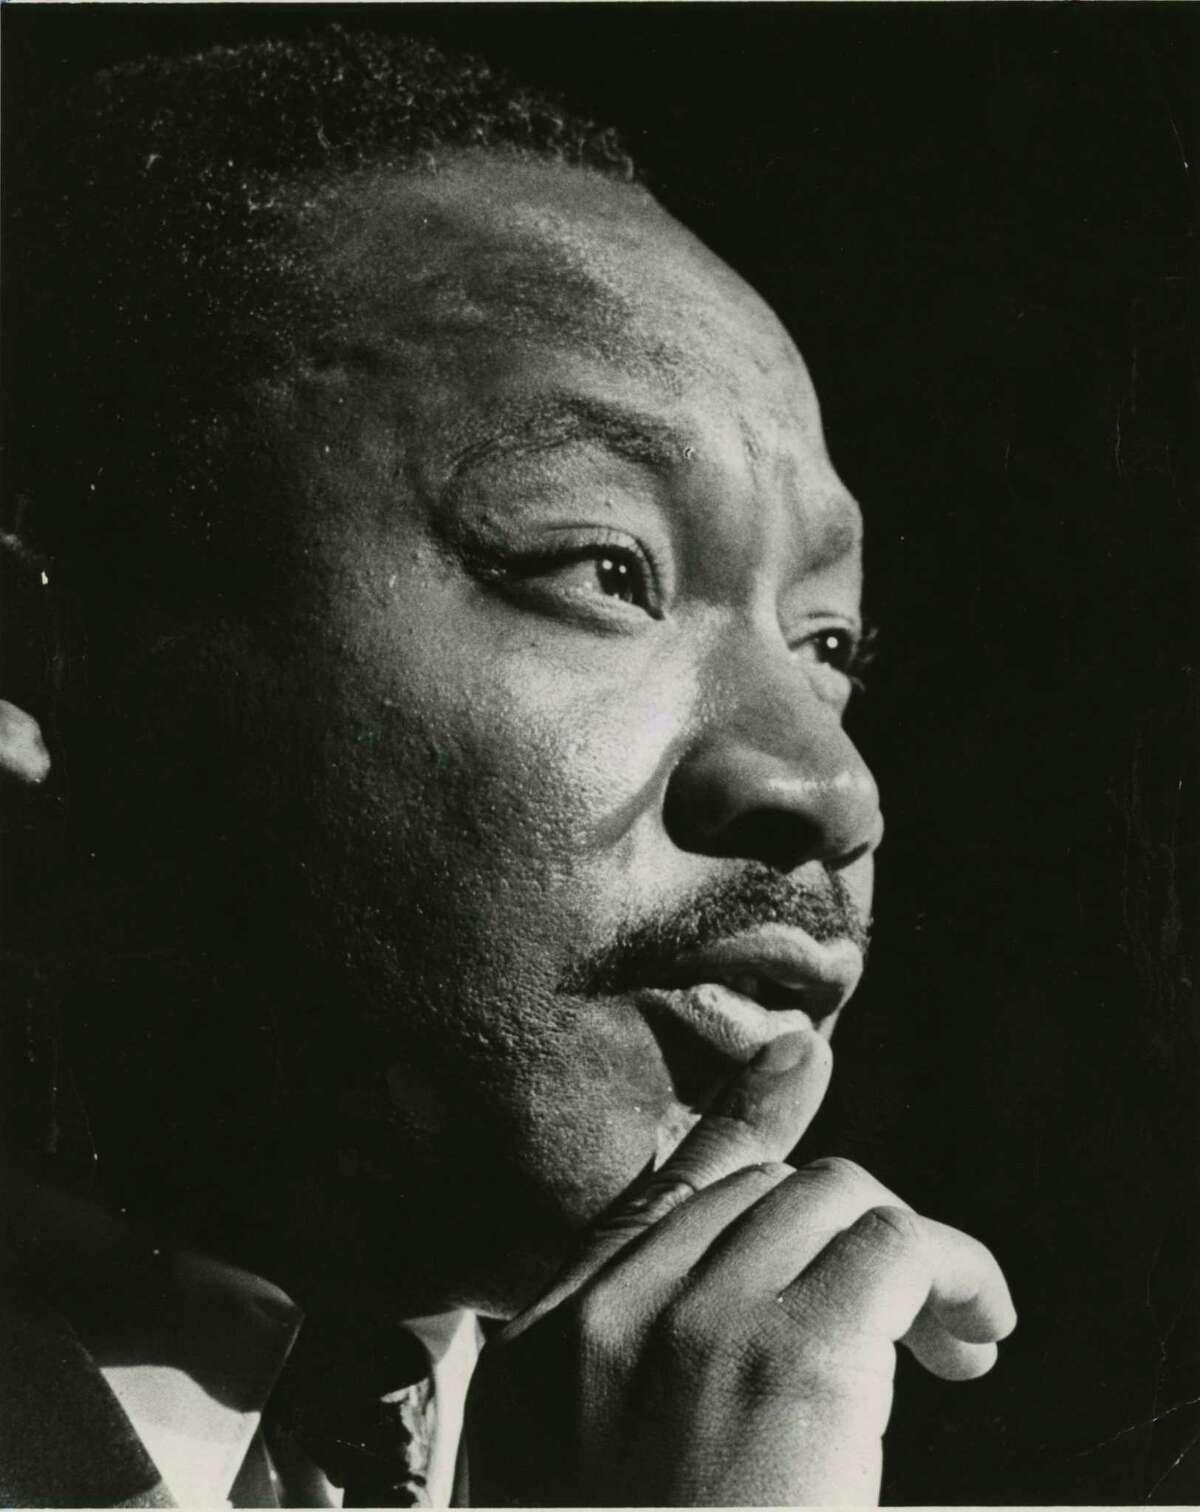 PHOTO FILED: MARTIN LUTHER KING JR. 10/17/1967 - Martin Luther King Jr. at the Sam Houston Coliseum, Oct 17, 1967 Blair Pittman / Houston Chronicle